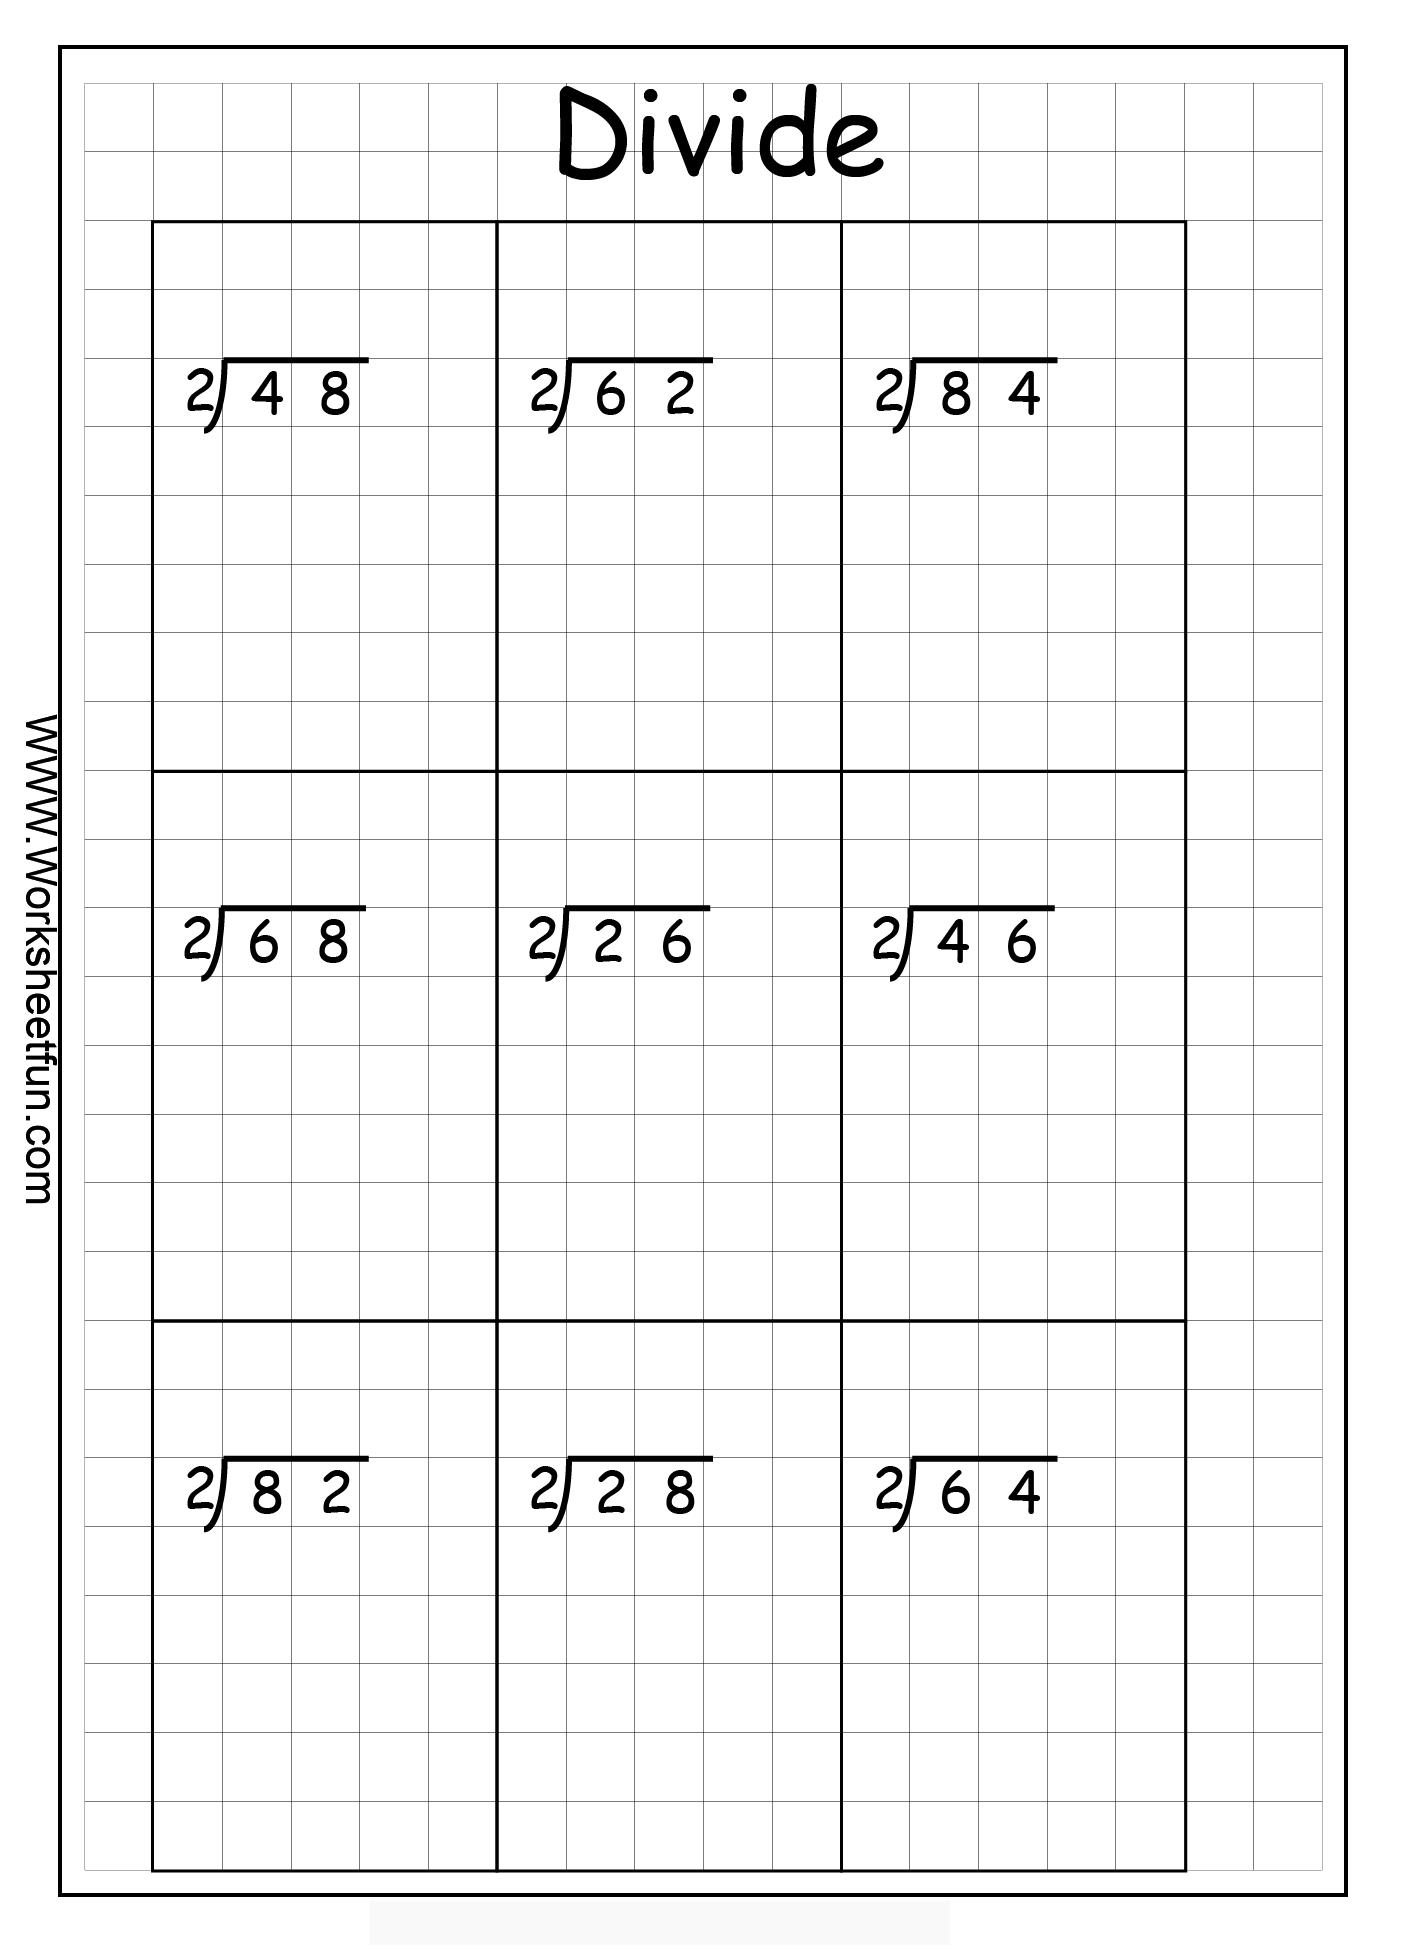 medium resolution of Long Division – 2 Digits By 1 Digit – No Remainder - 10 Worksheets   Division  worksheets